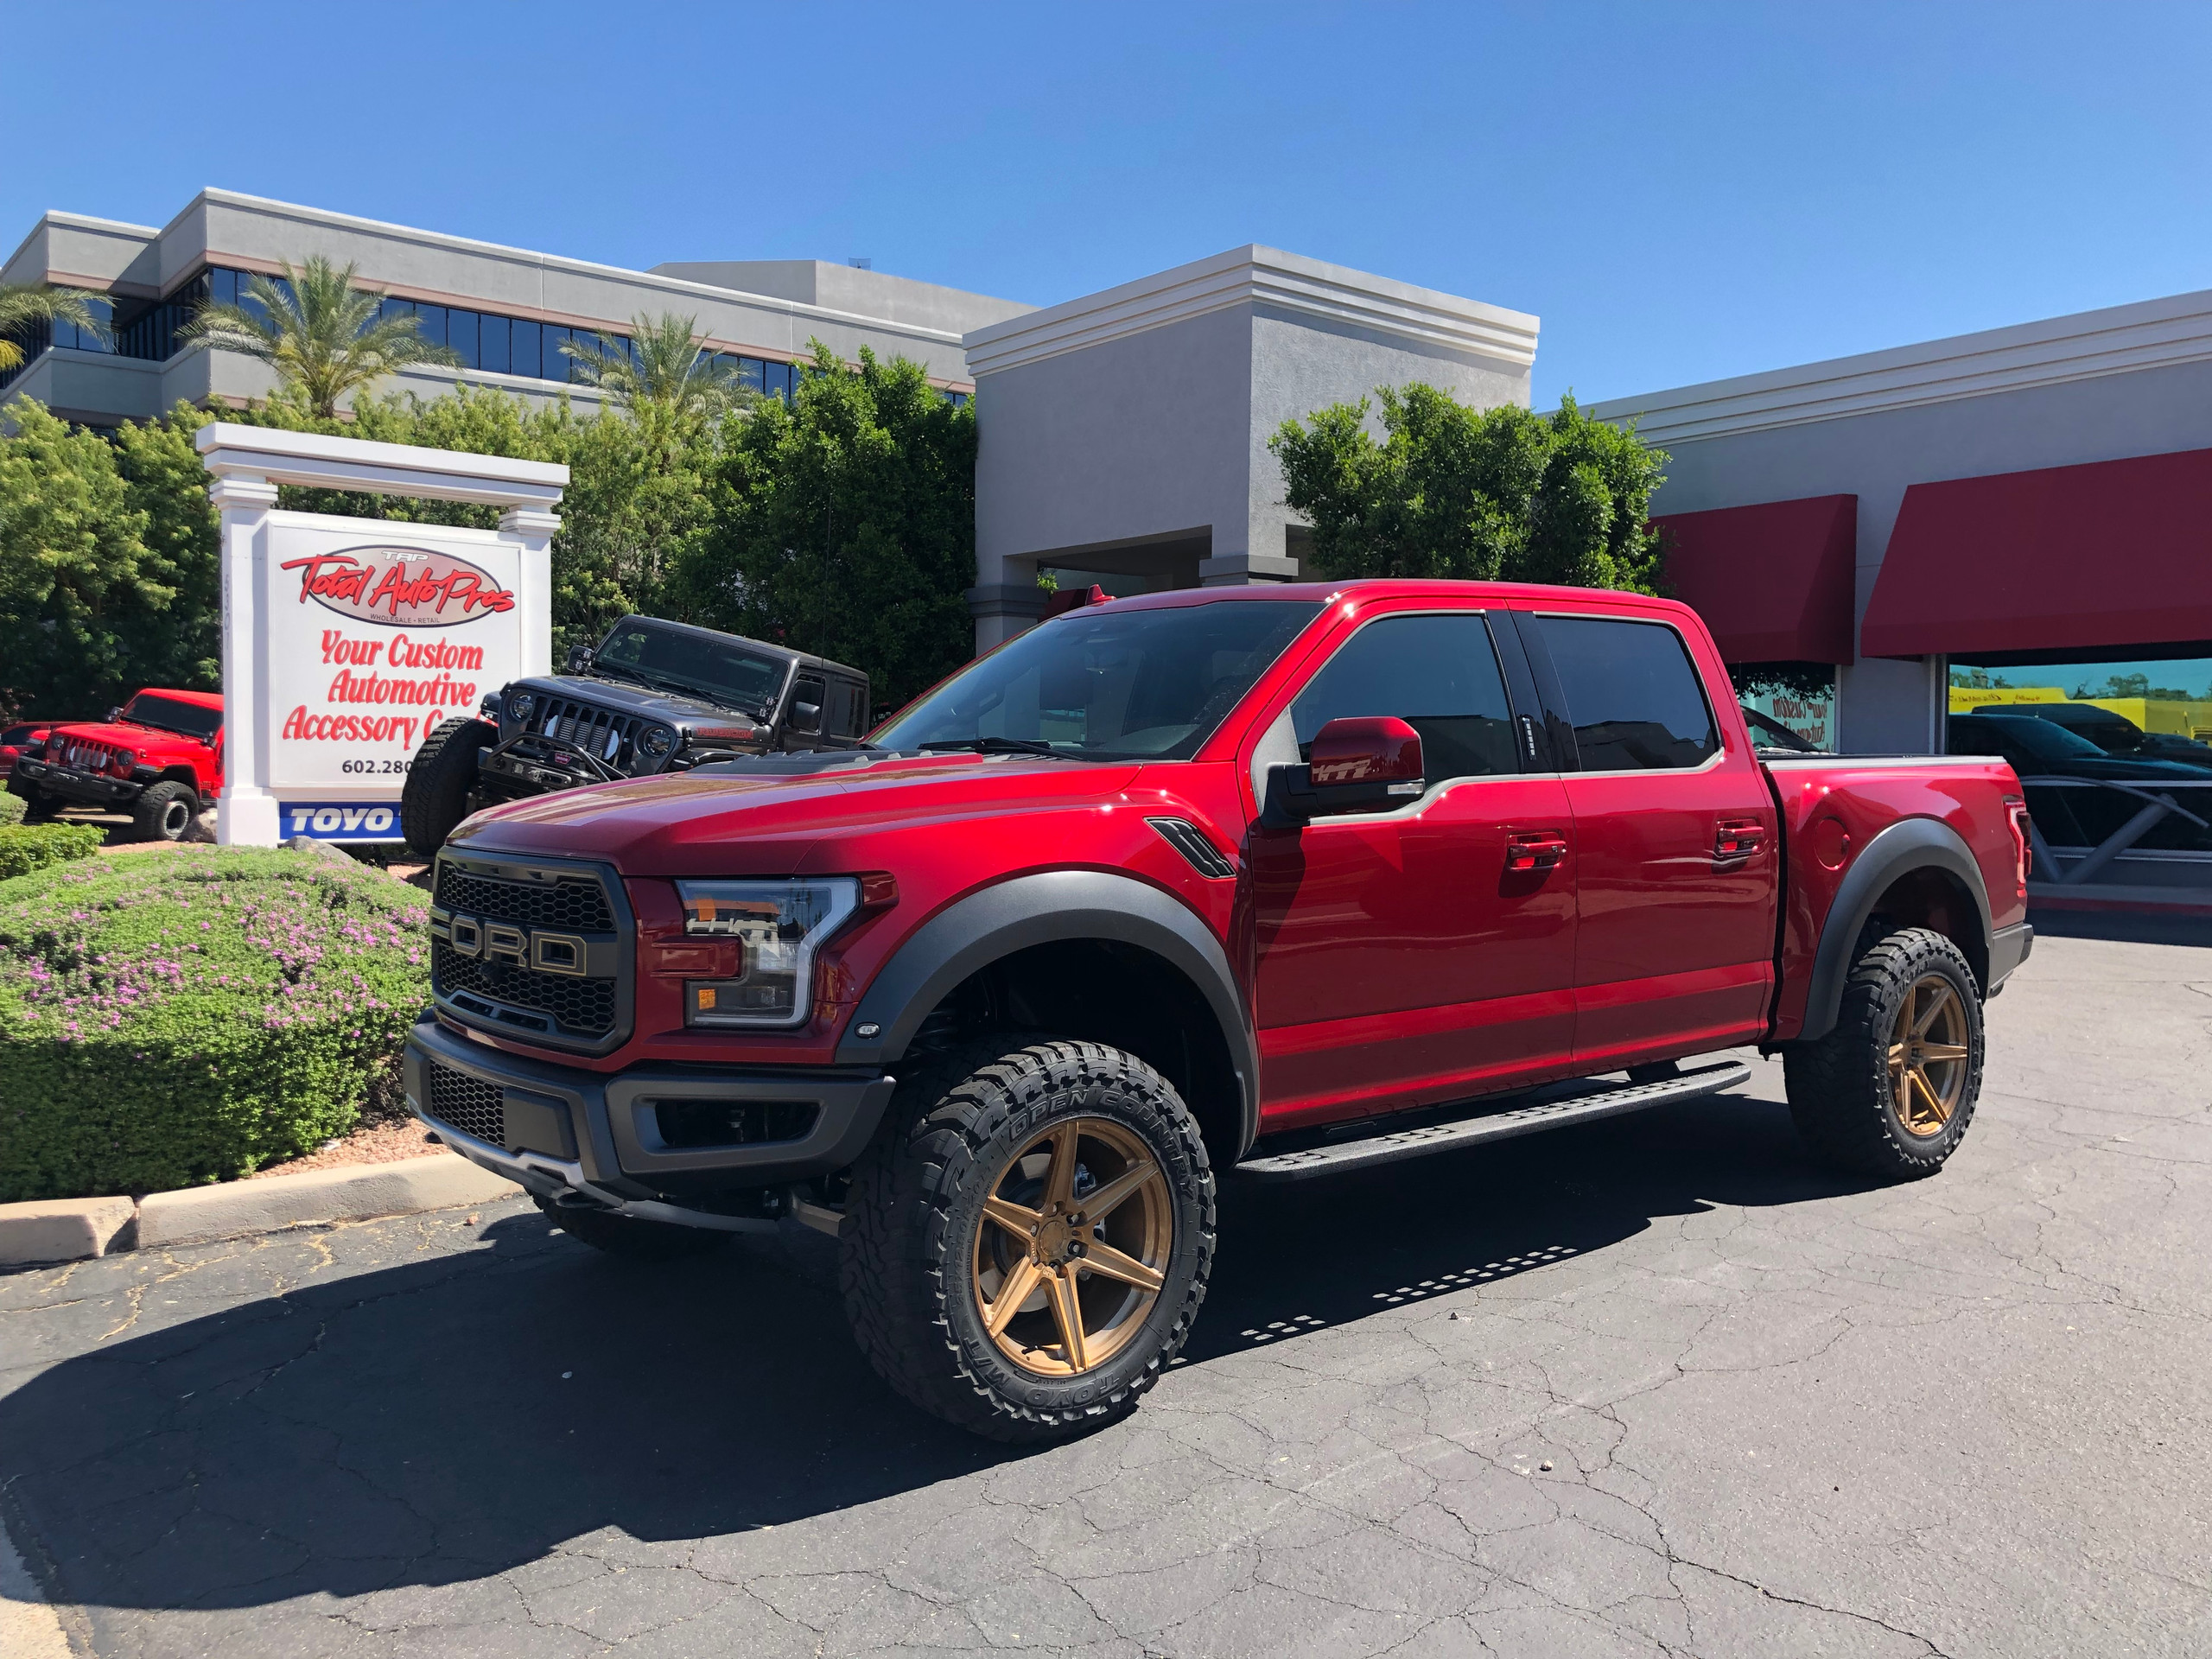 2019 Ford Raptor Toyo tires Magnaflow ex